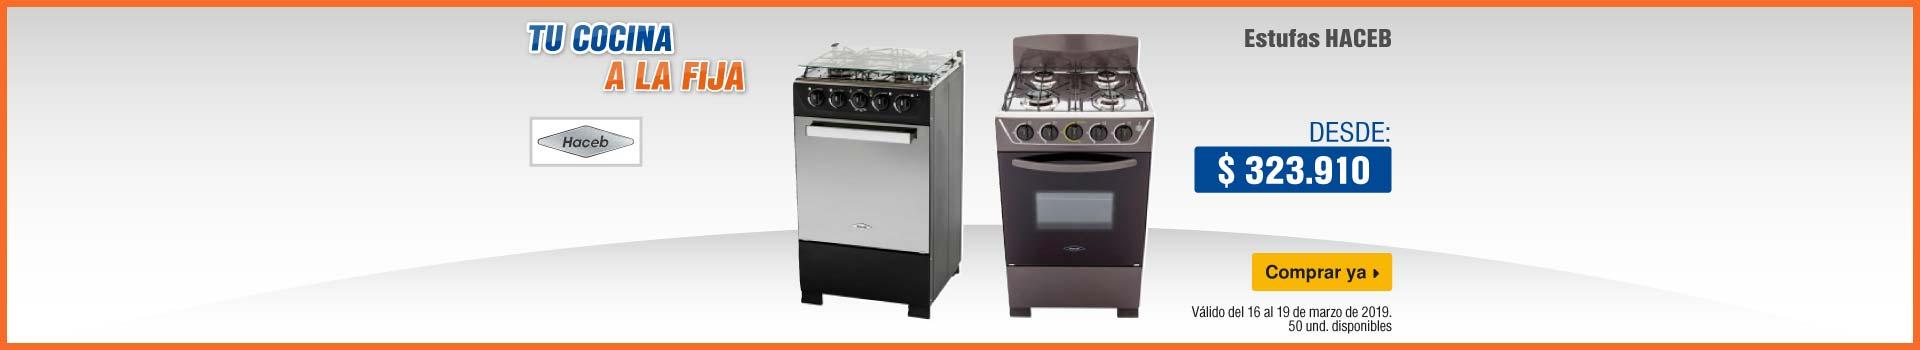 AK-KT-mayores-1-ELECT-BCAT-cocina-haceb-160319-2